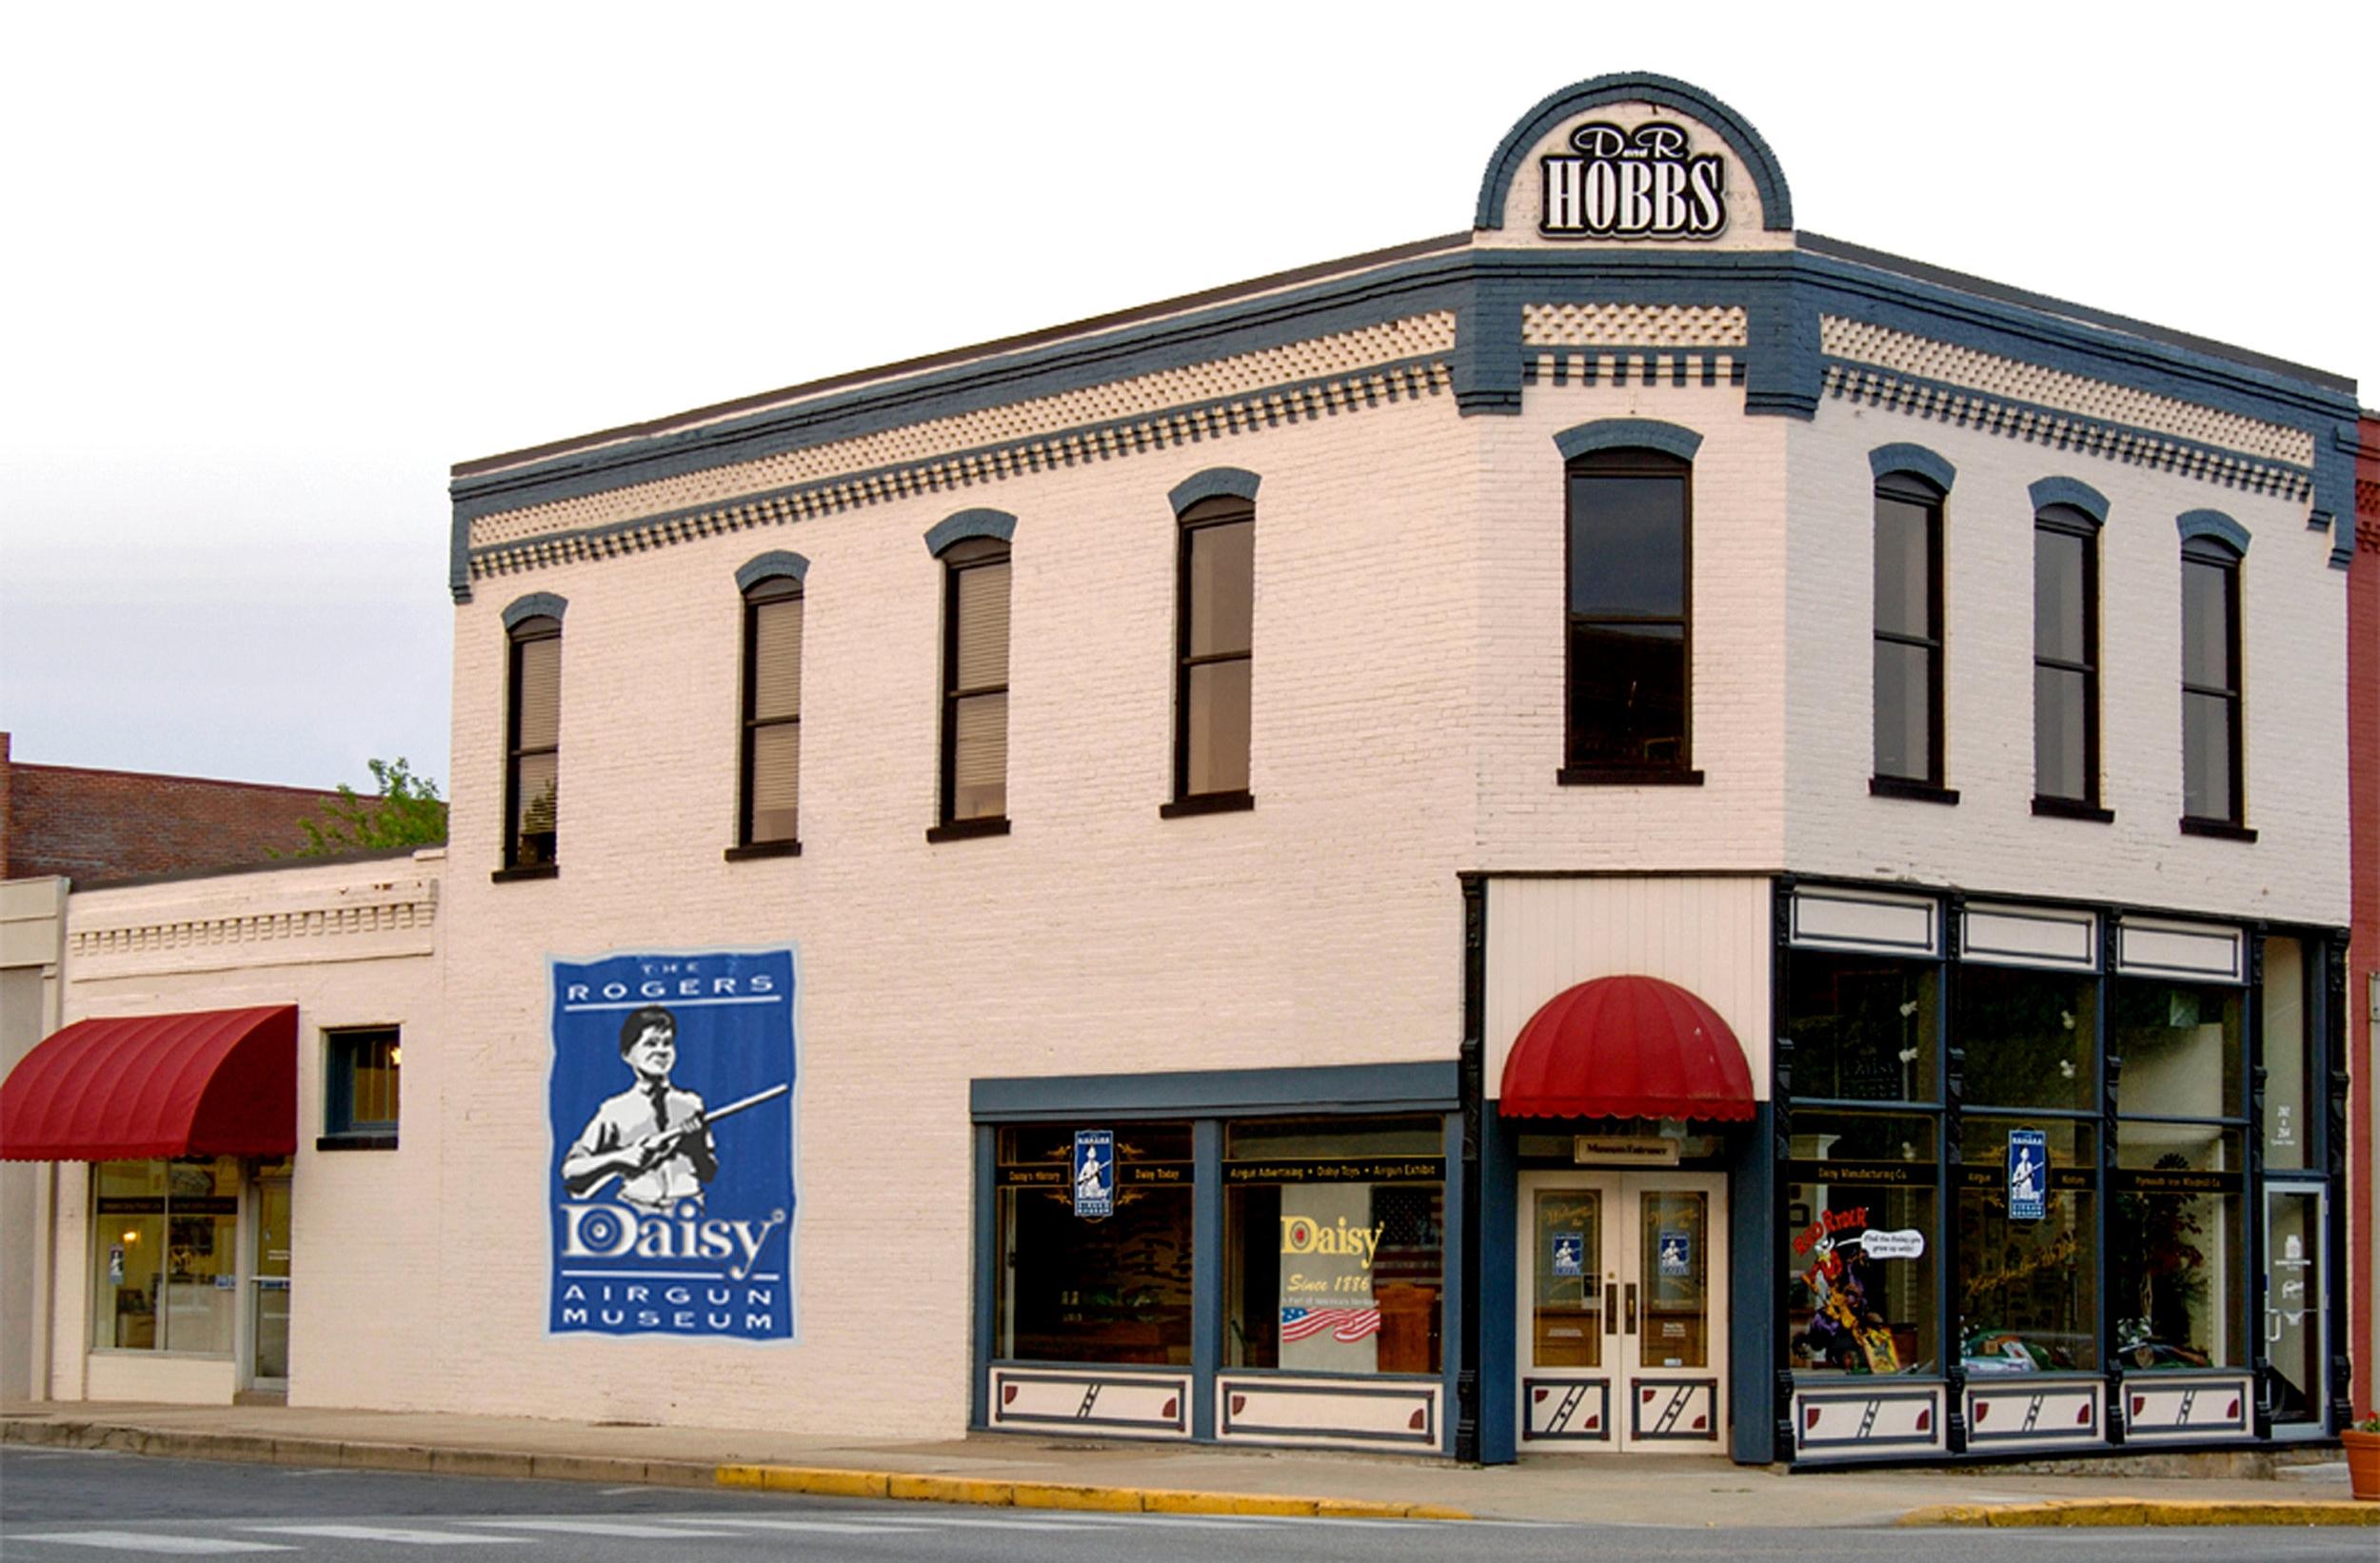 Daisy Museum Rogers, Arkansas